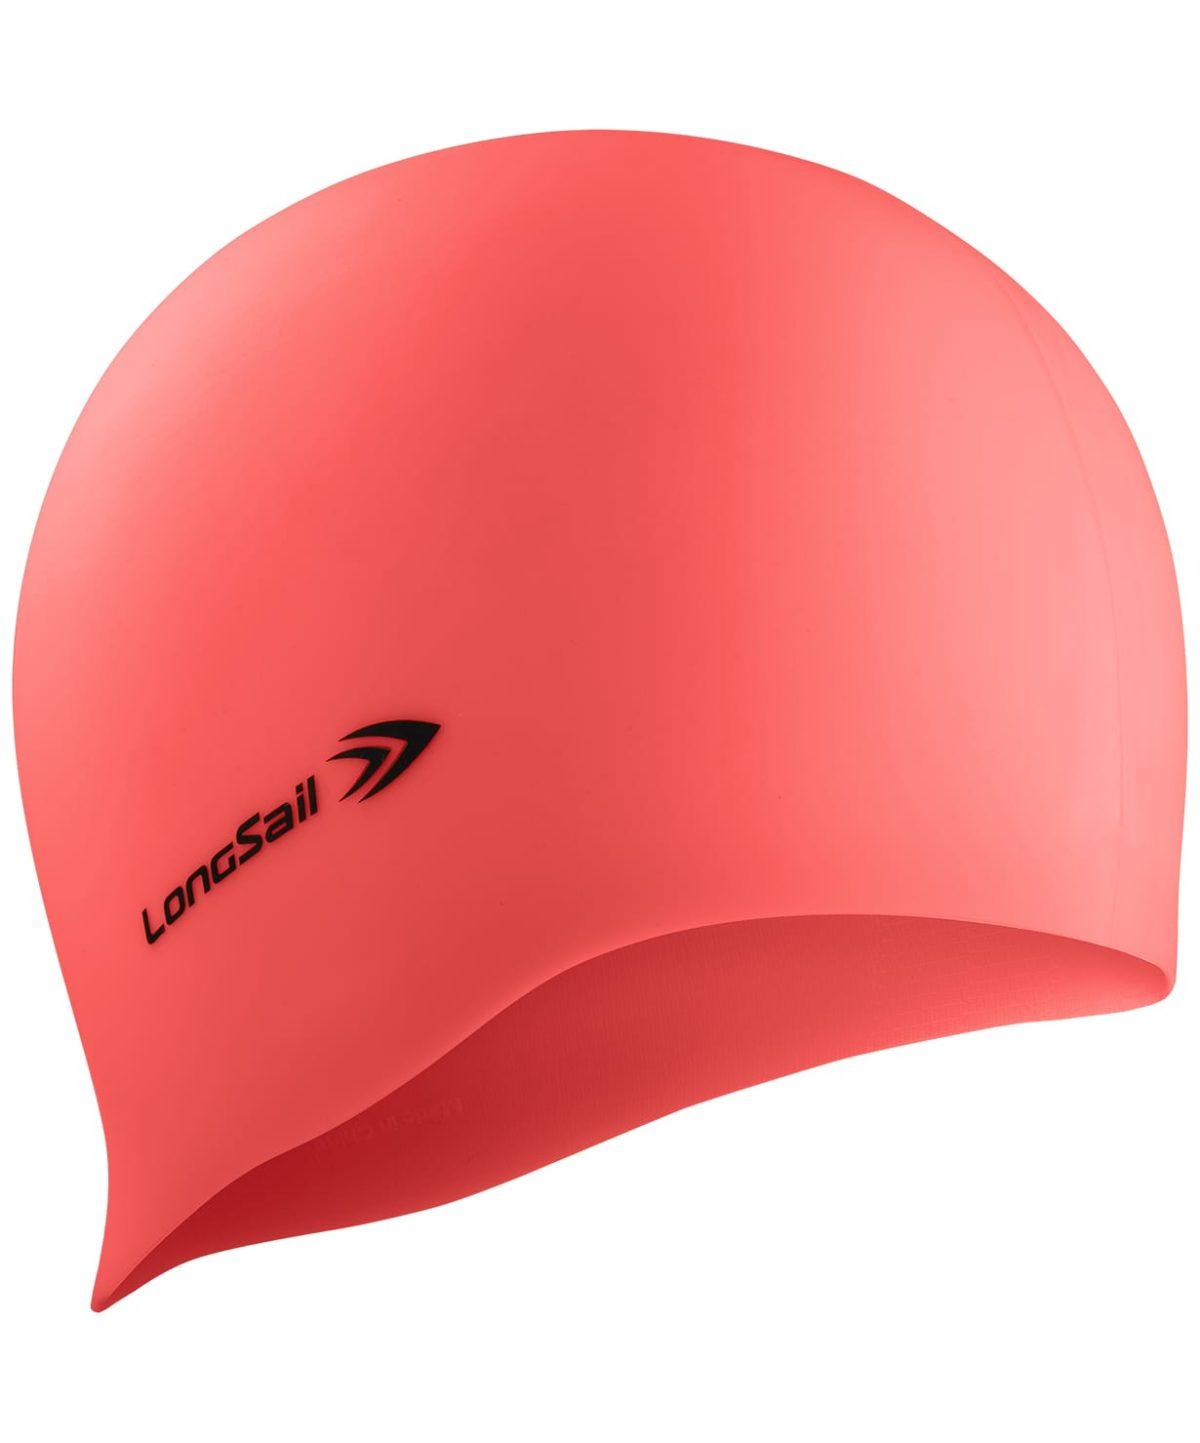 LONGSAIL  Шапочка для плавания силикон: коралл - 1